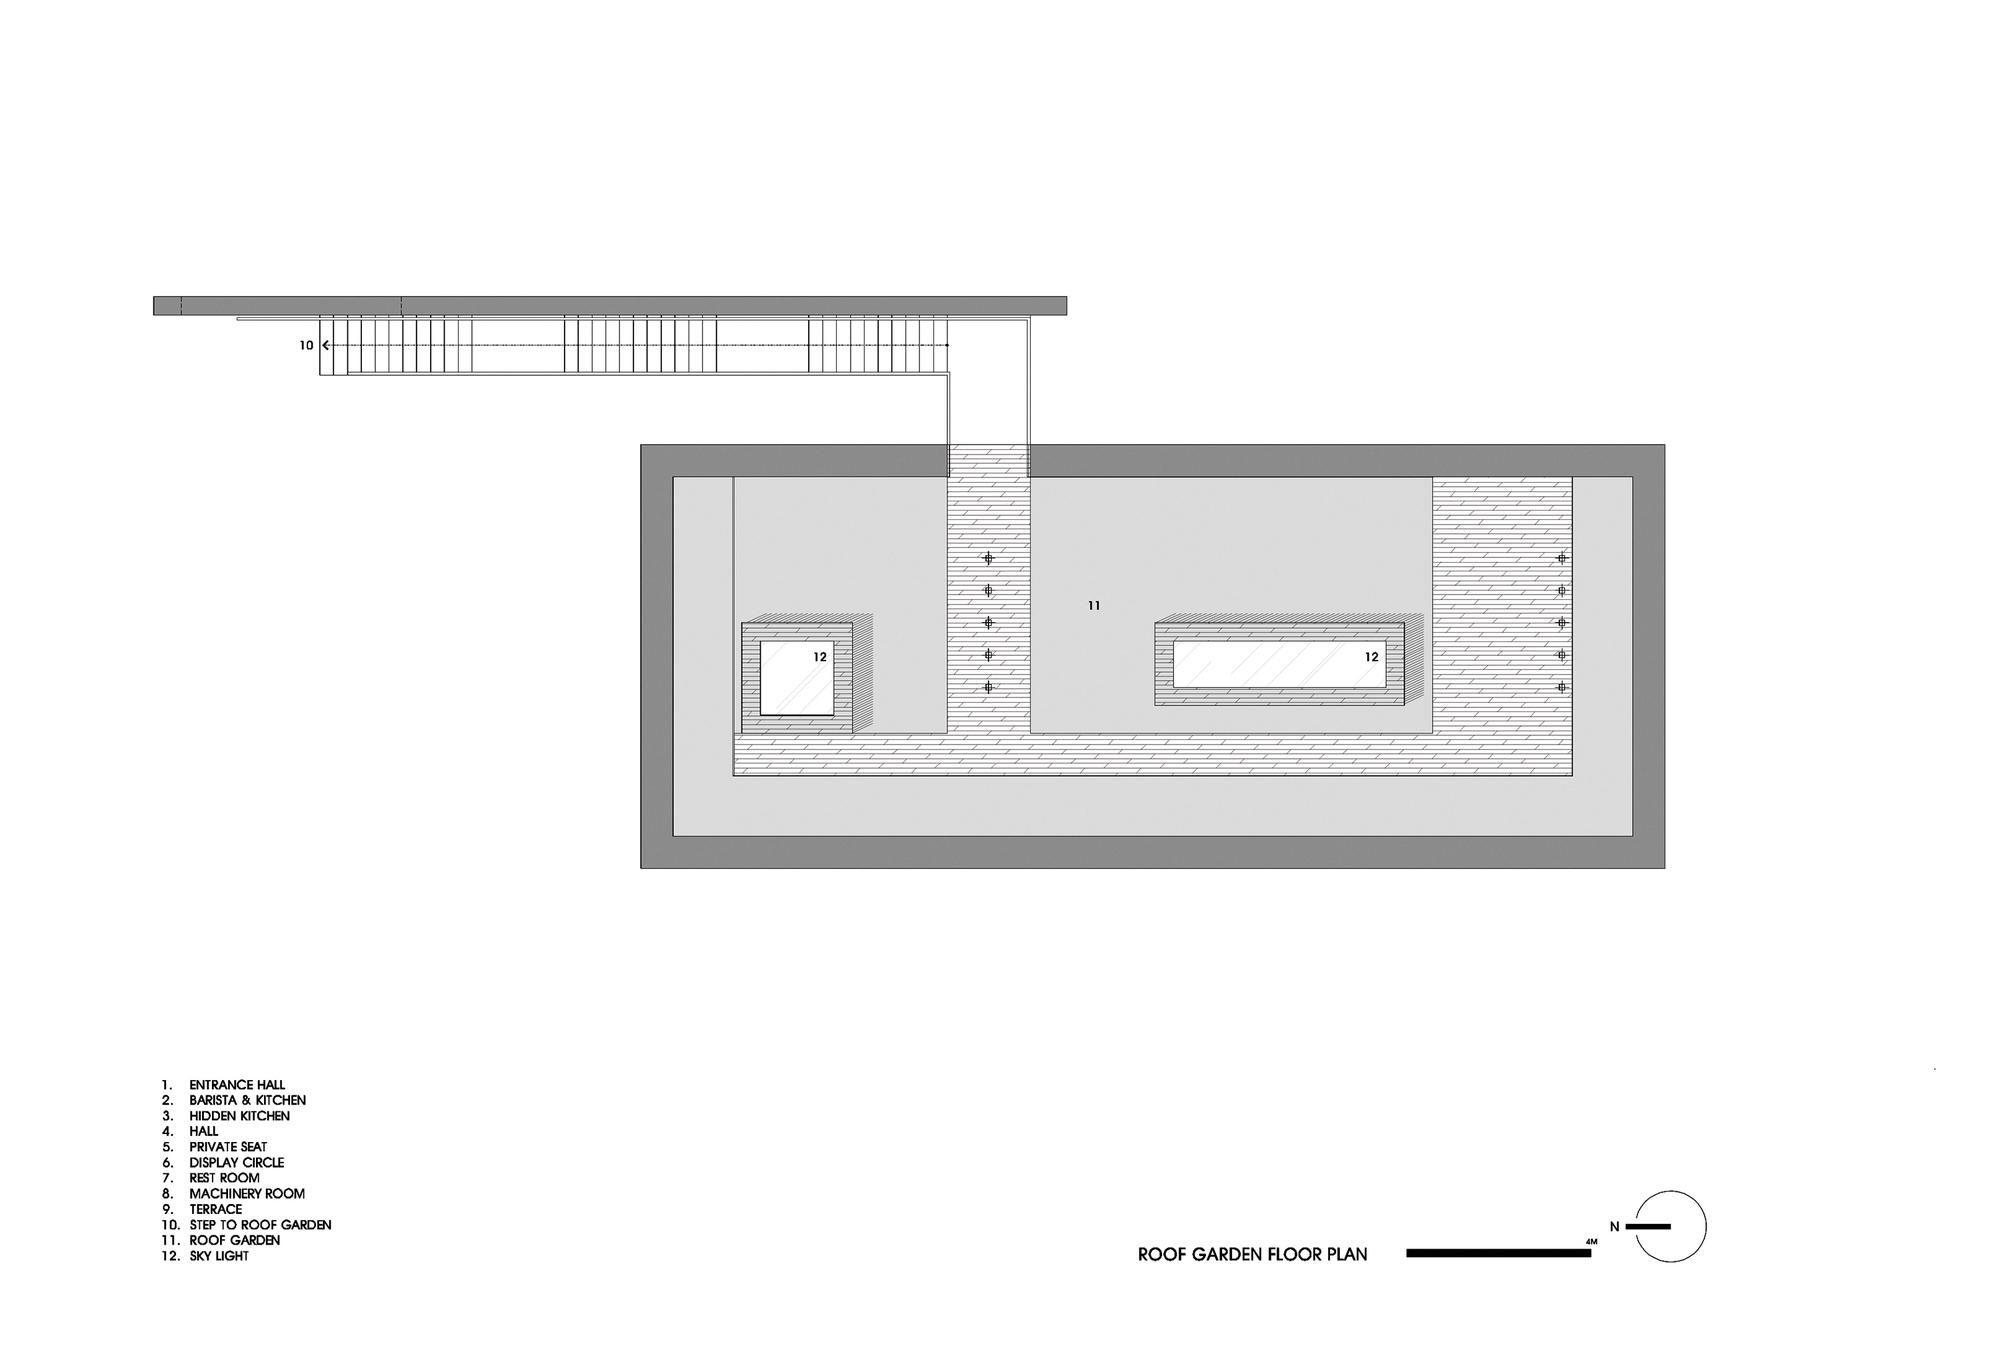 gallery of platform monsant platform a 15 roof plan